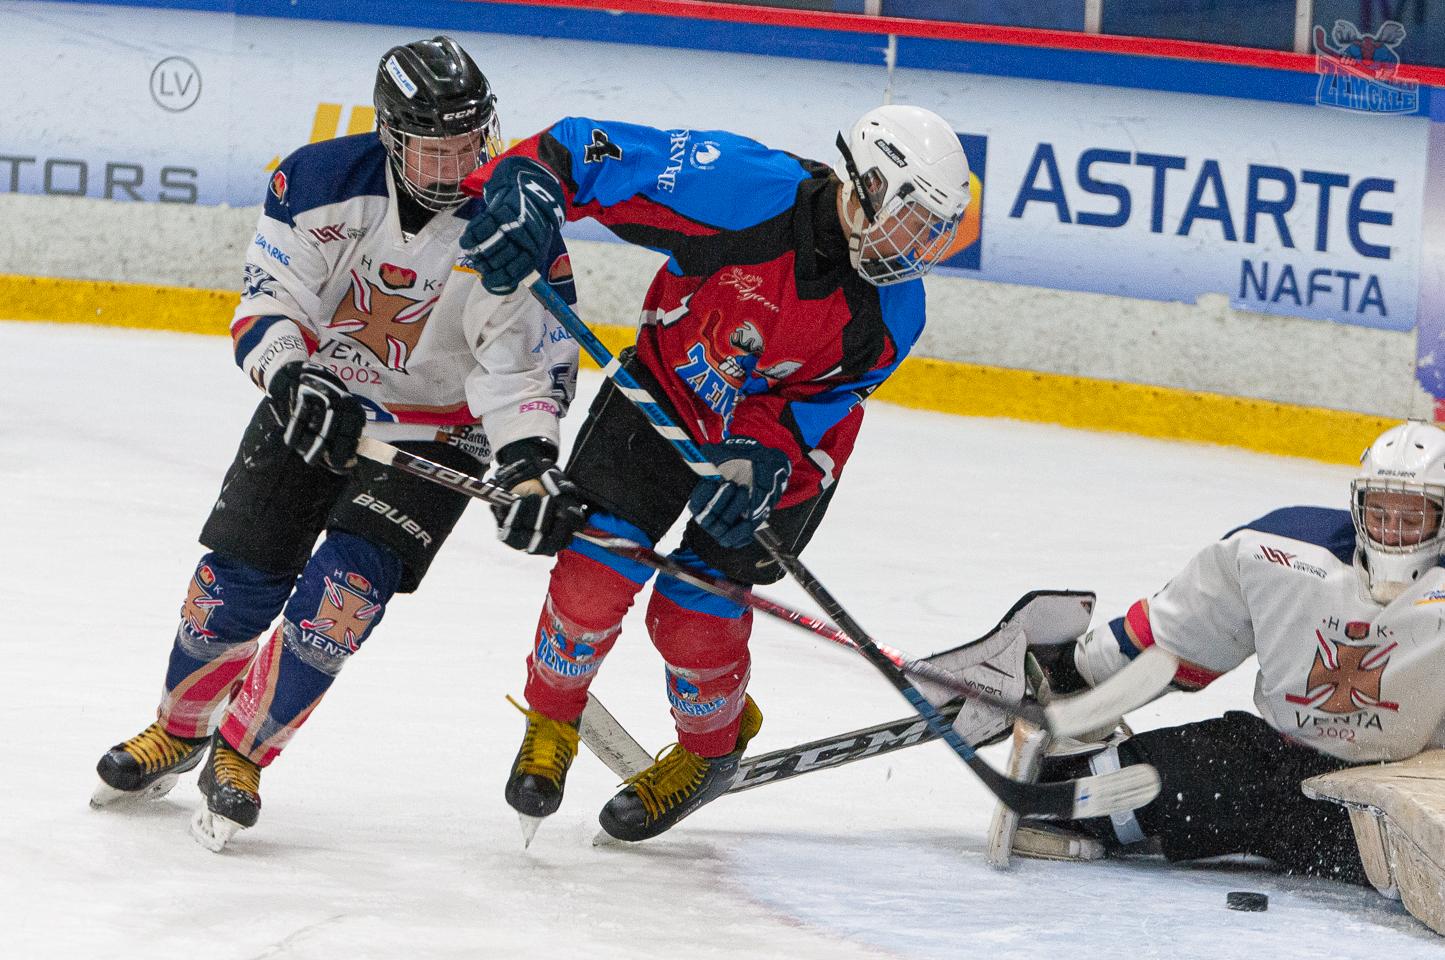 Jelgavas hokeja skola JLSS U17 - Venta 2002 14092019-32